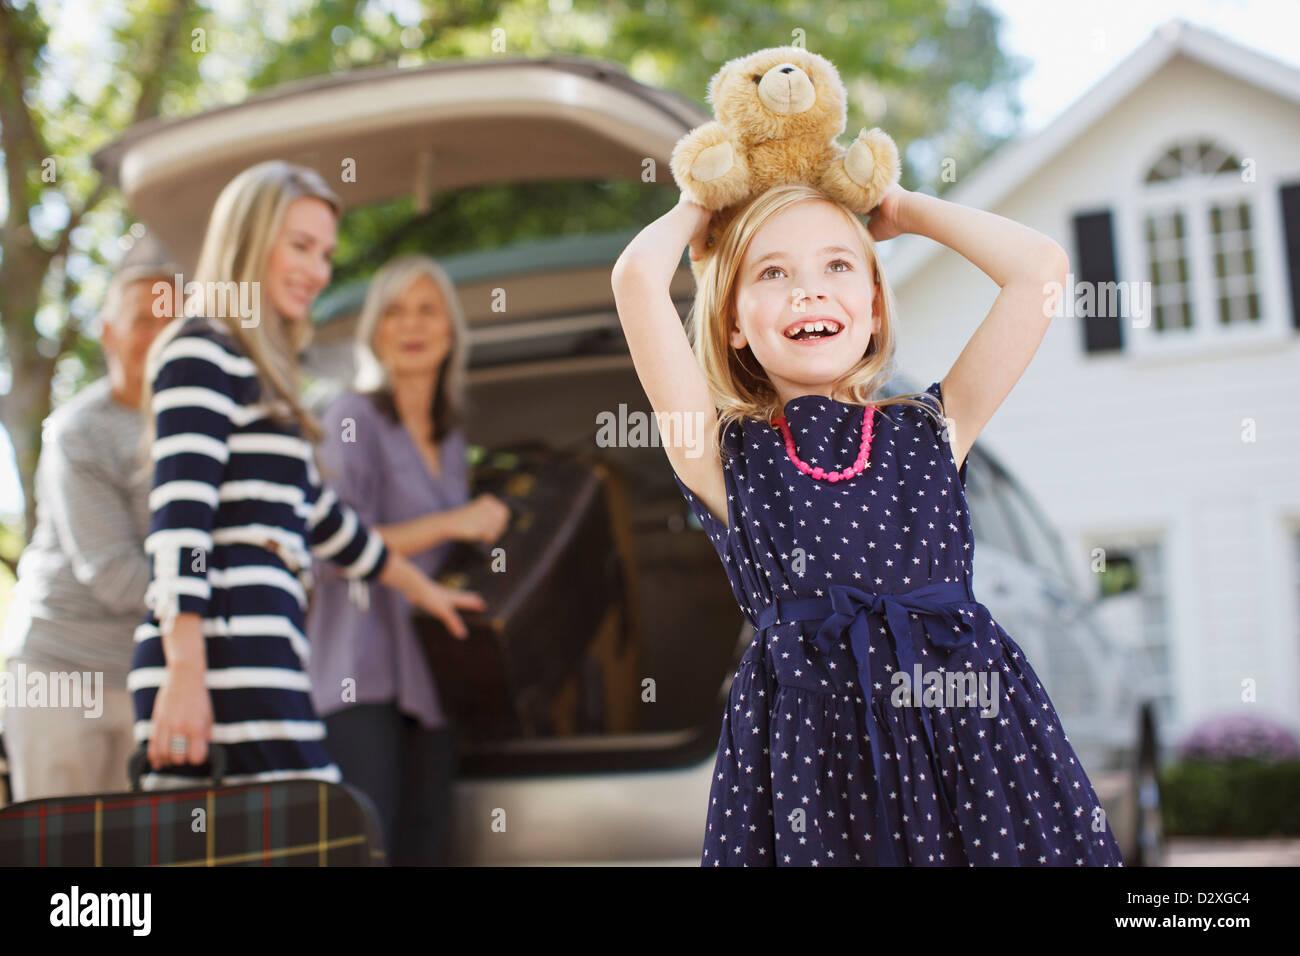 Girl carrying teddy bear on her head Stock Photo